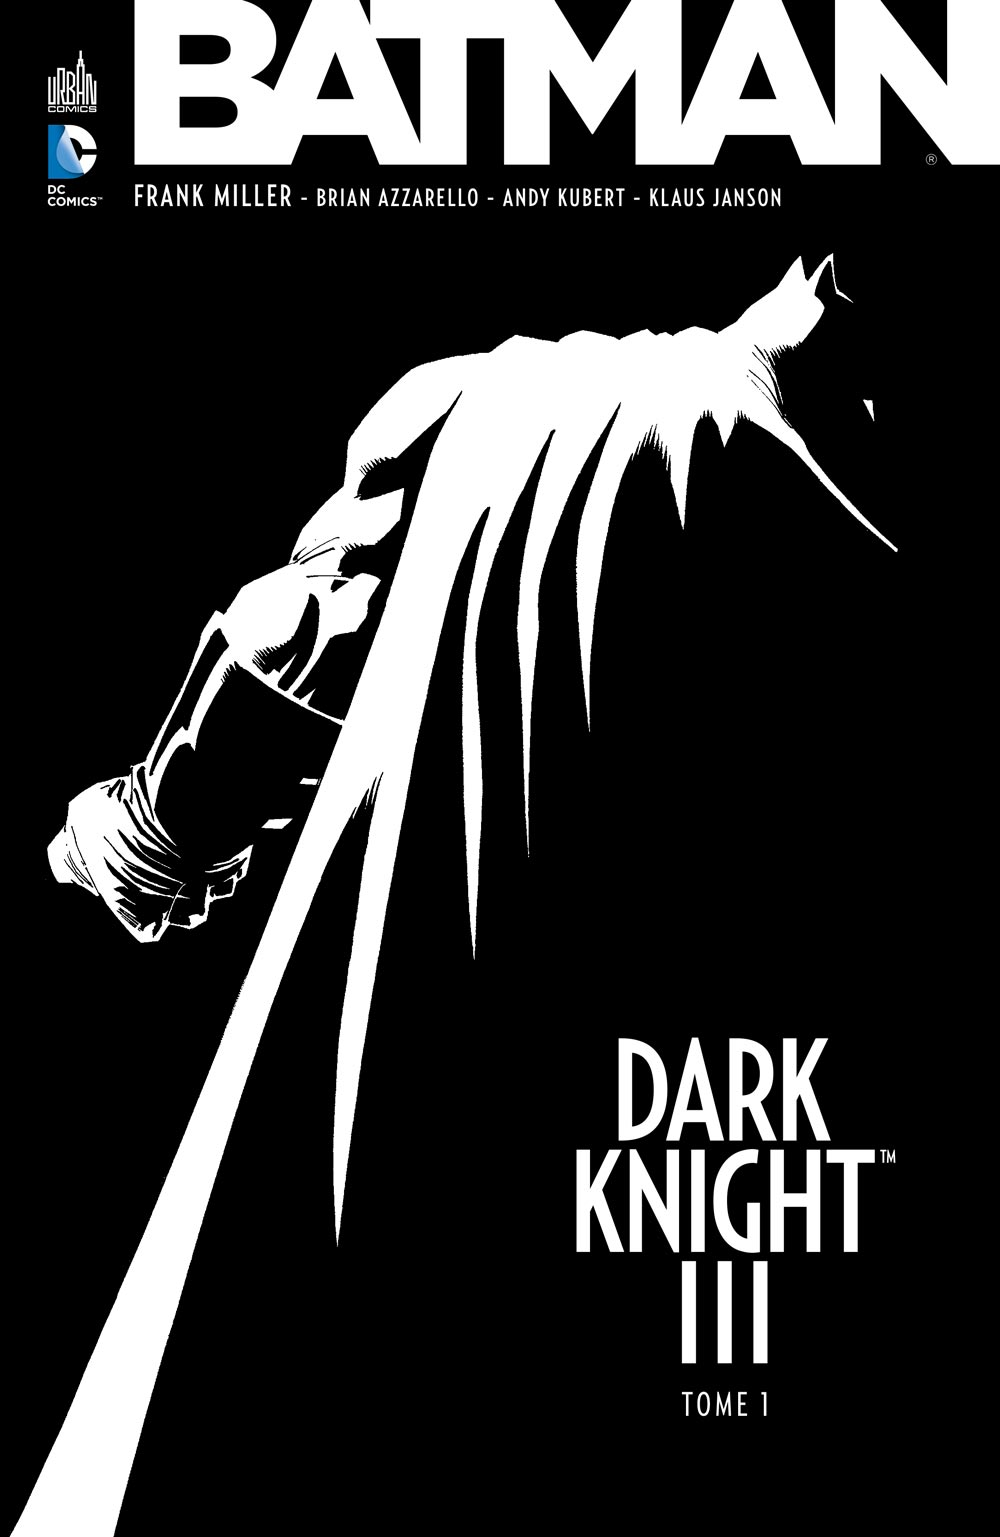 Dark Knight III - The Master Race 1 - Tome 1